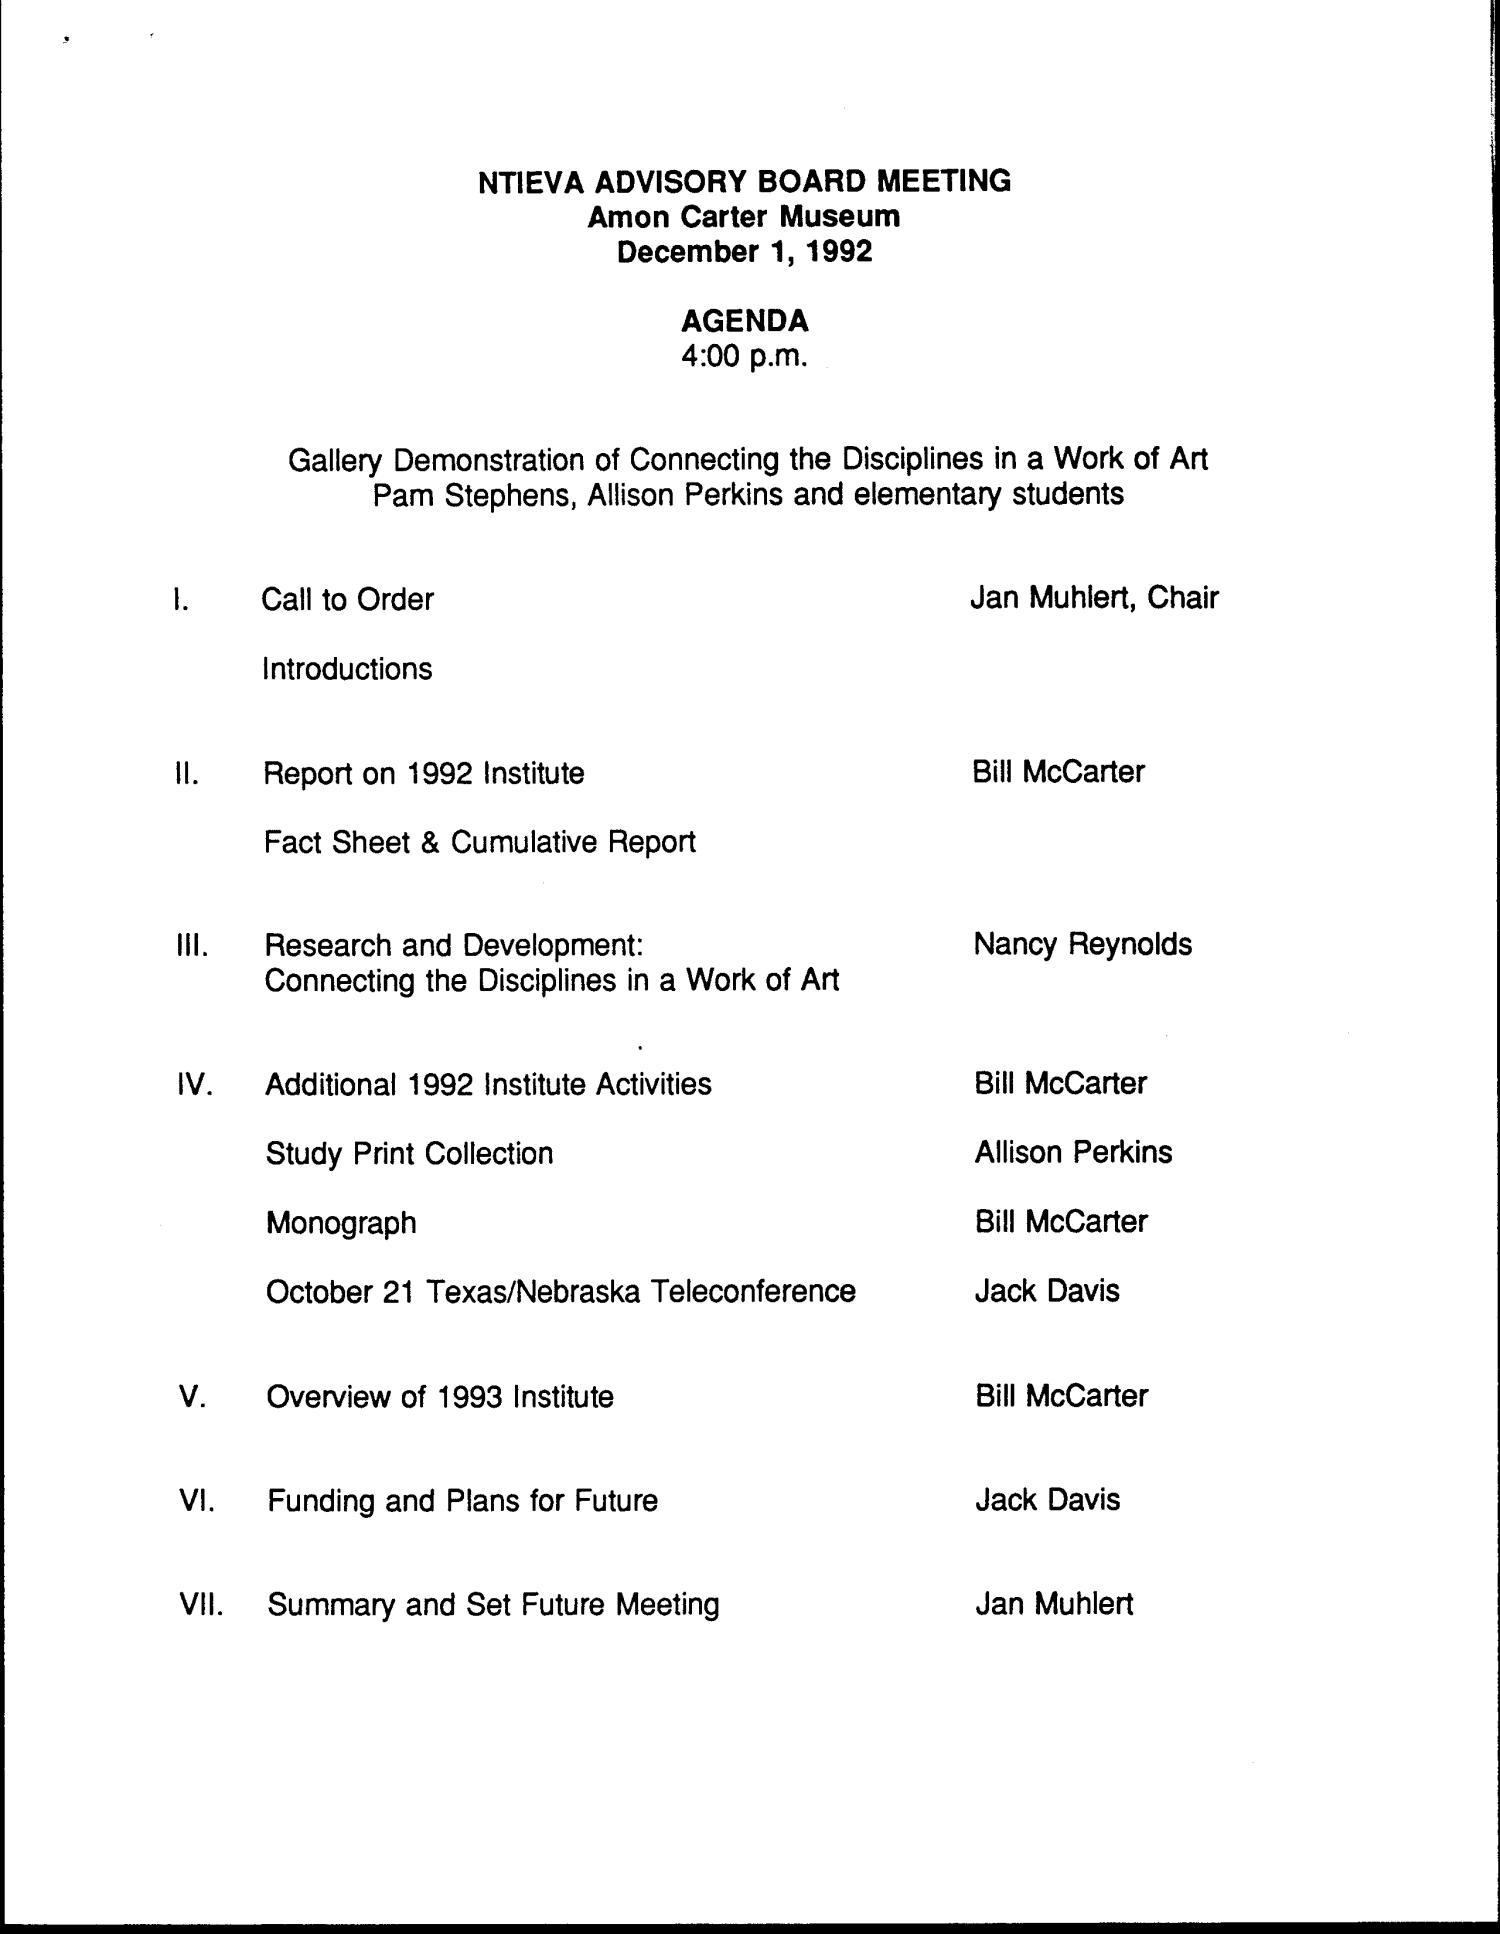 NTIEVA Advisory Board Meeting Agenda, December 30, 30992   UNT ...